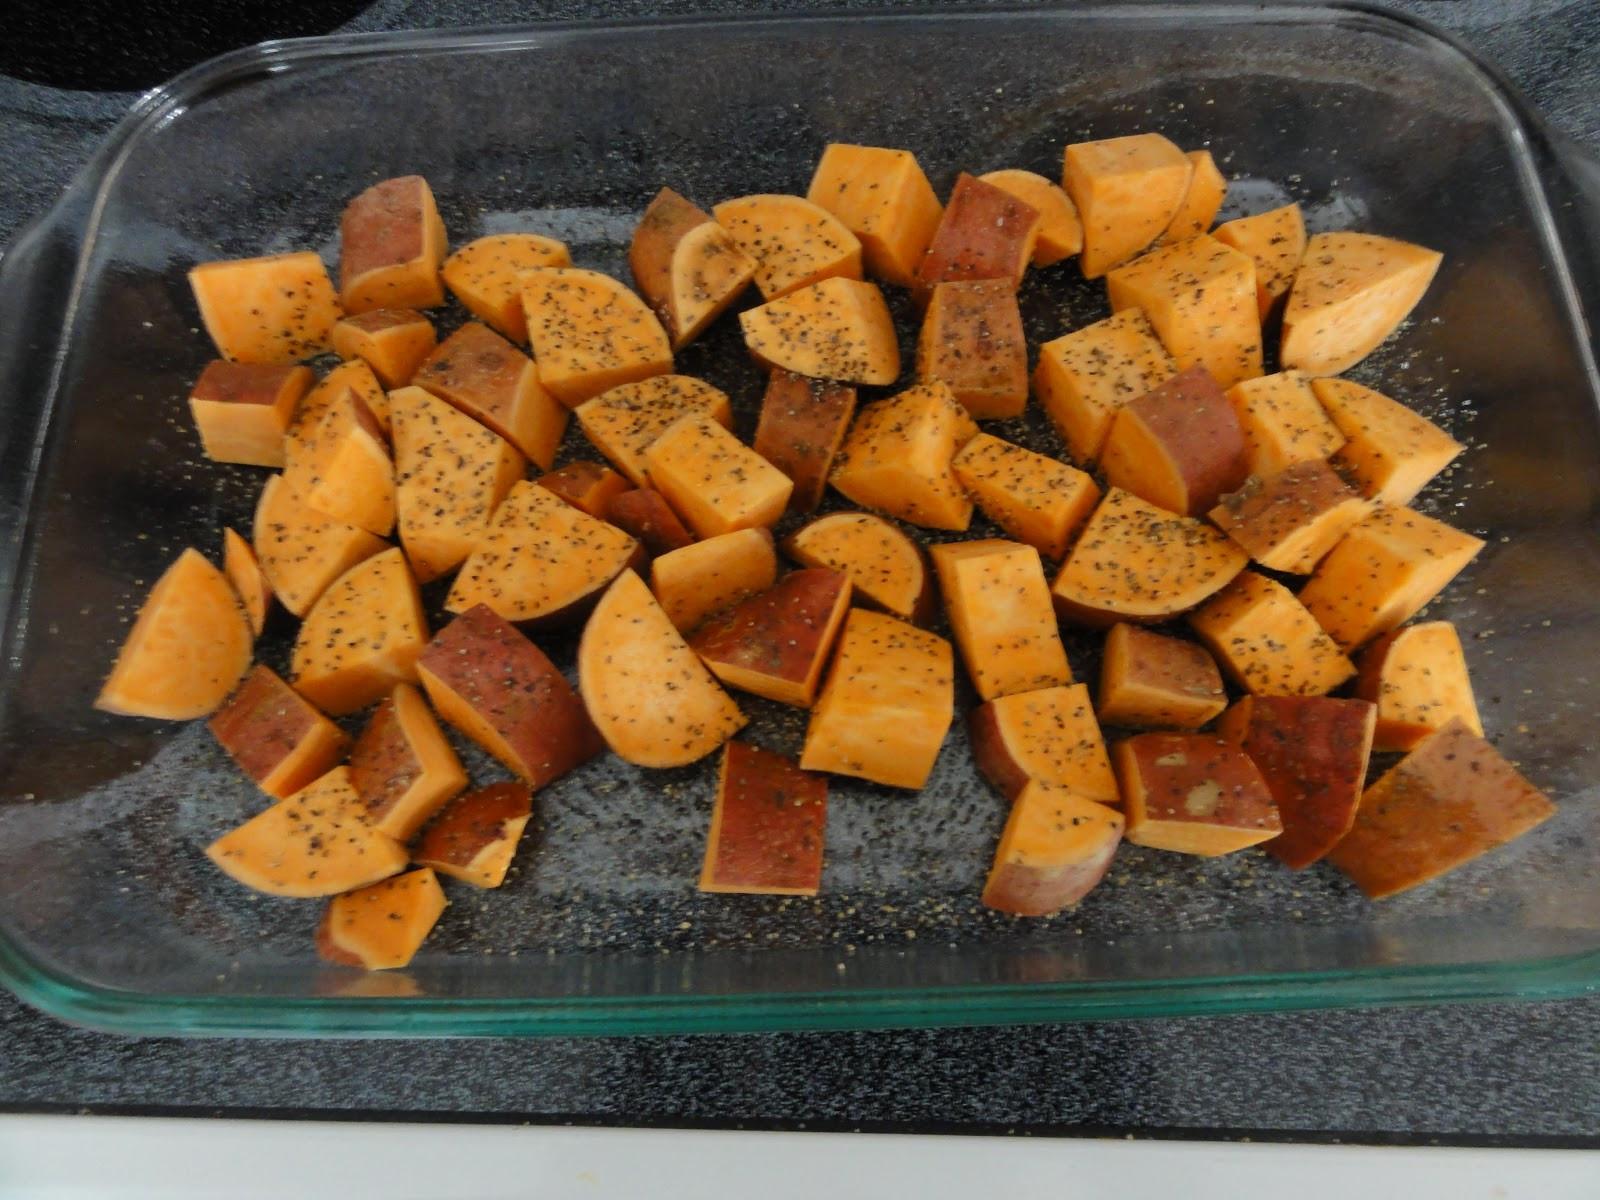 Baked Sweet Potato Cubes  Clean Eat Recipe Sweet Potato Cubes He and She Eat Clean